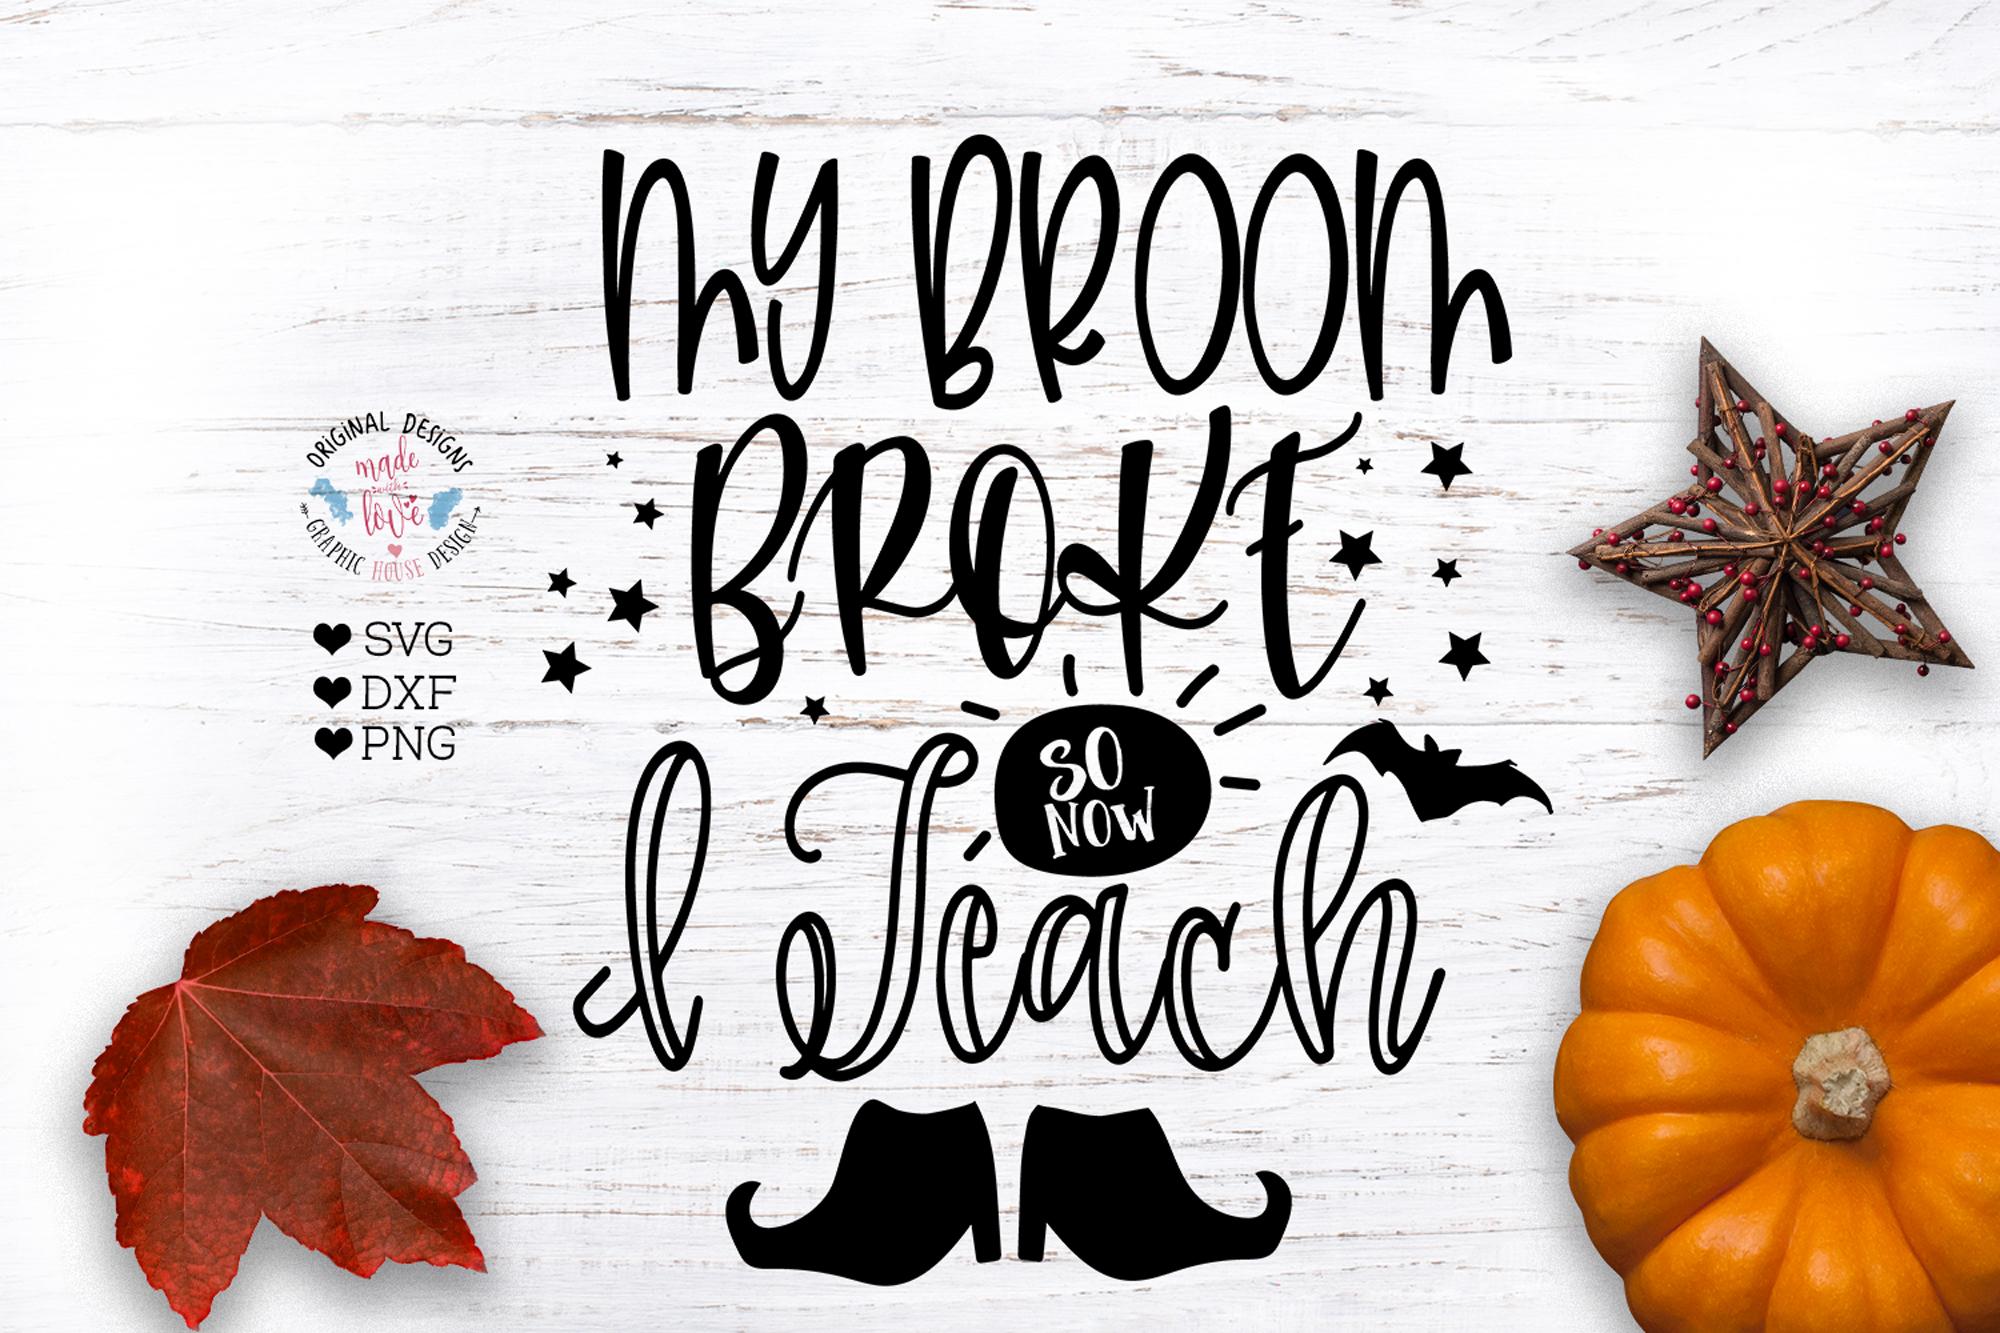 My Broom Broke So Now I Teach - Funny Halloween Cut File example image 1